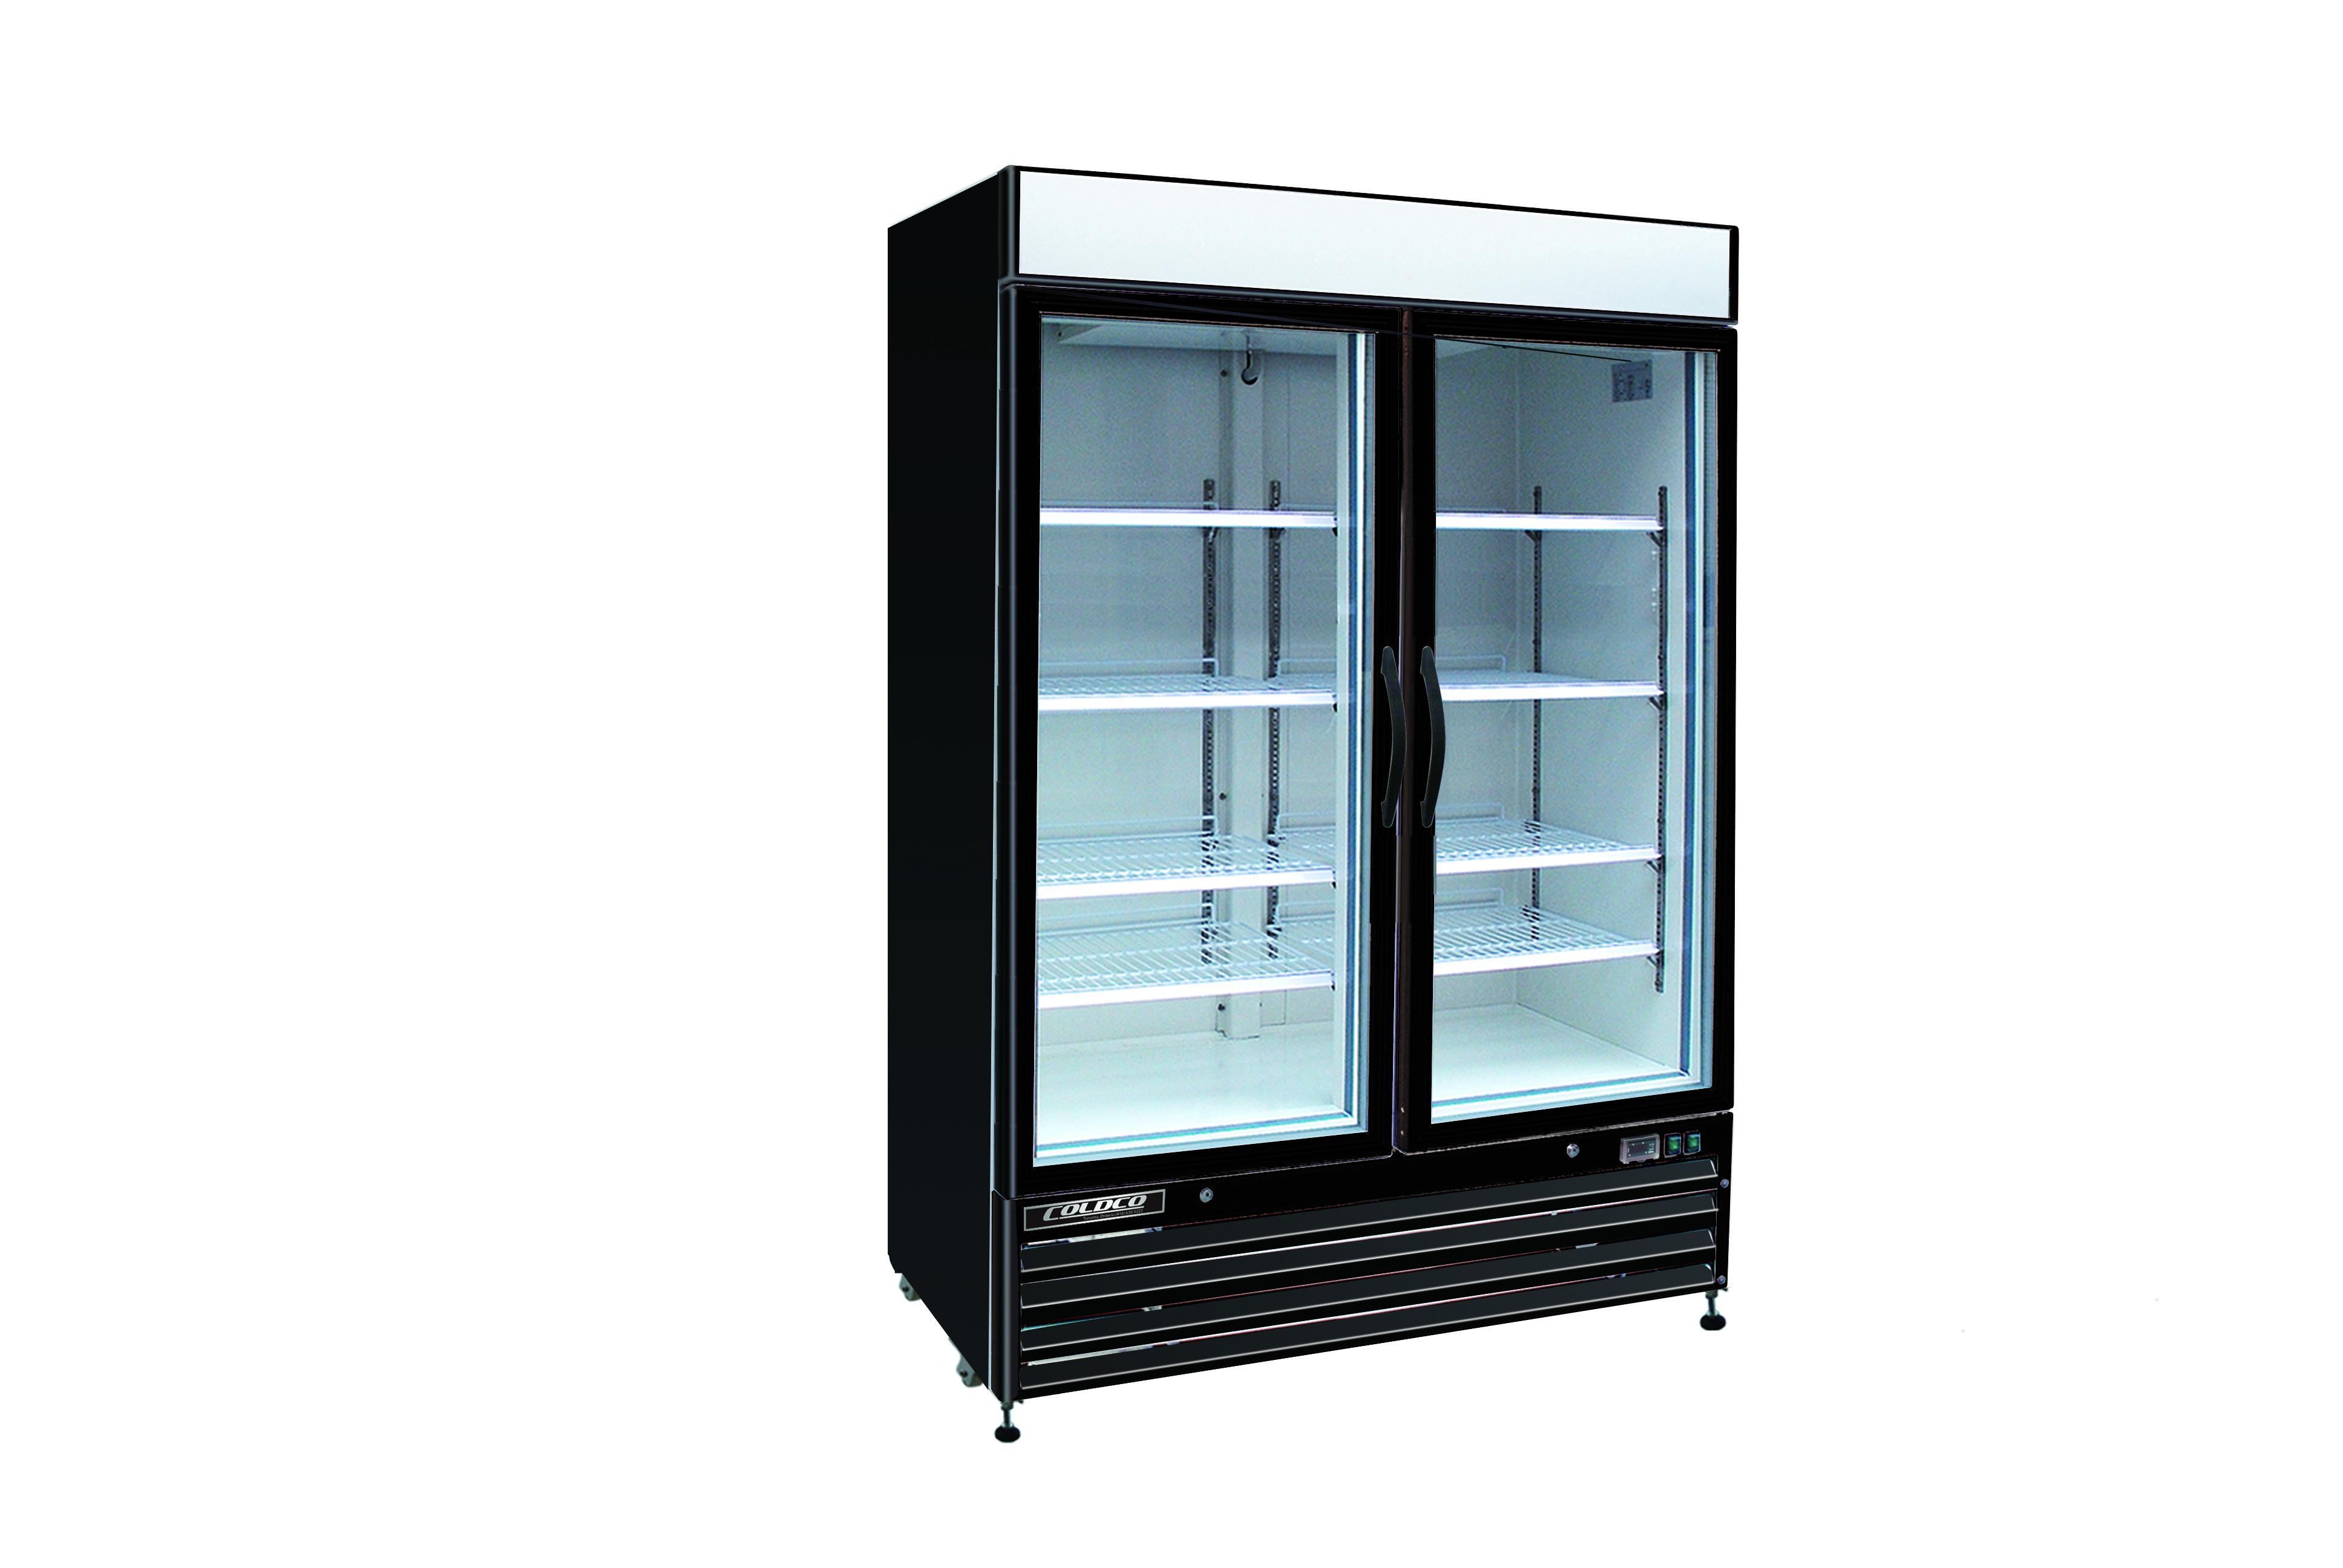 Toronto refrigeration and freezer retailer of hussmann true bgd series model bgd 48fdv black 54 coldco 2 door glass freezer vertical glass door 115208 230v black exterior planetlyrics Choice Image